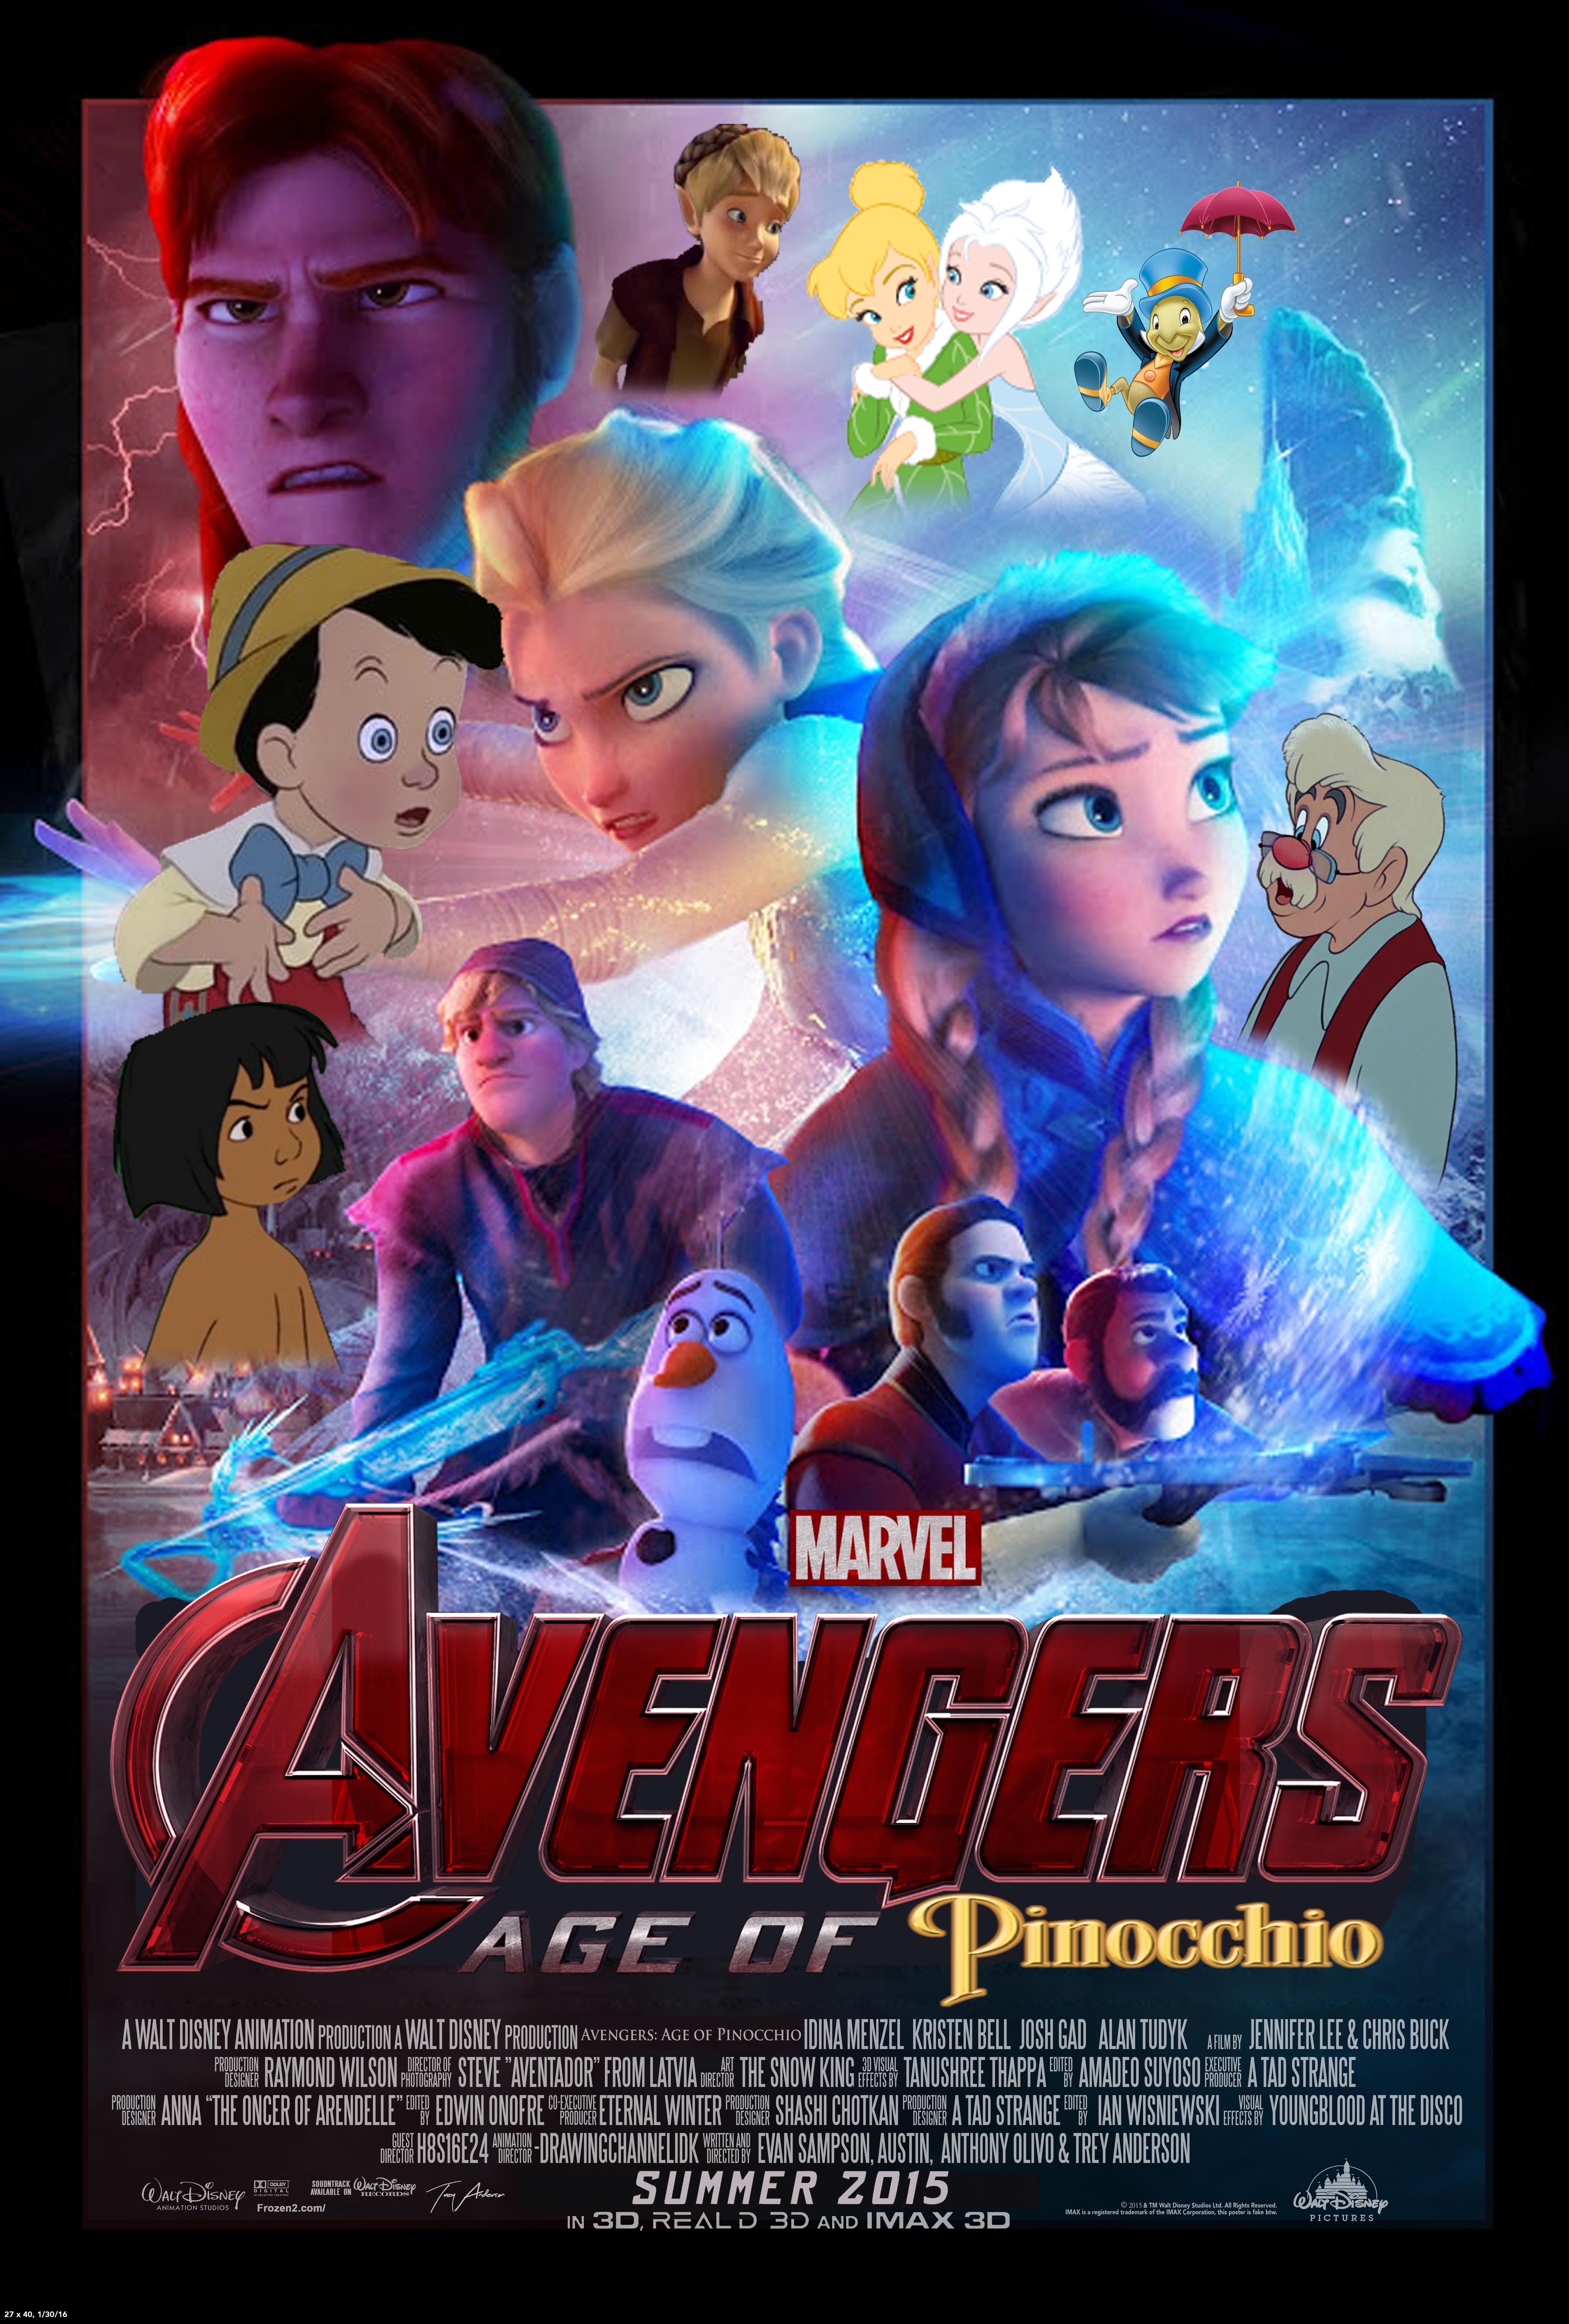 Disney's Avengers: Age of Pinocchio Poster